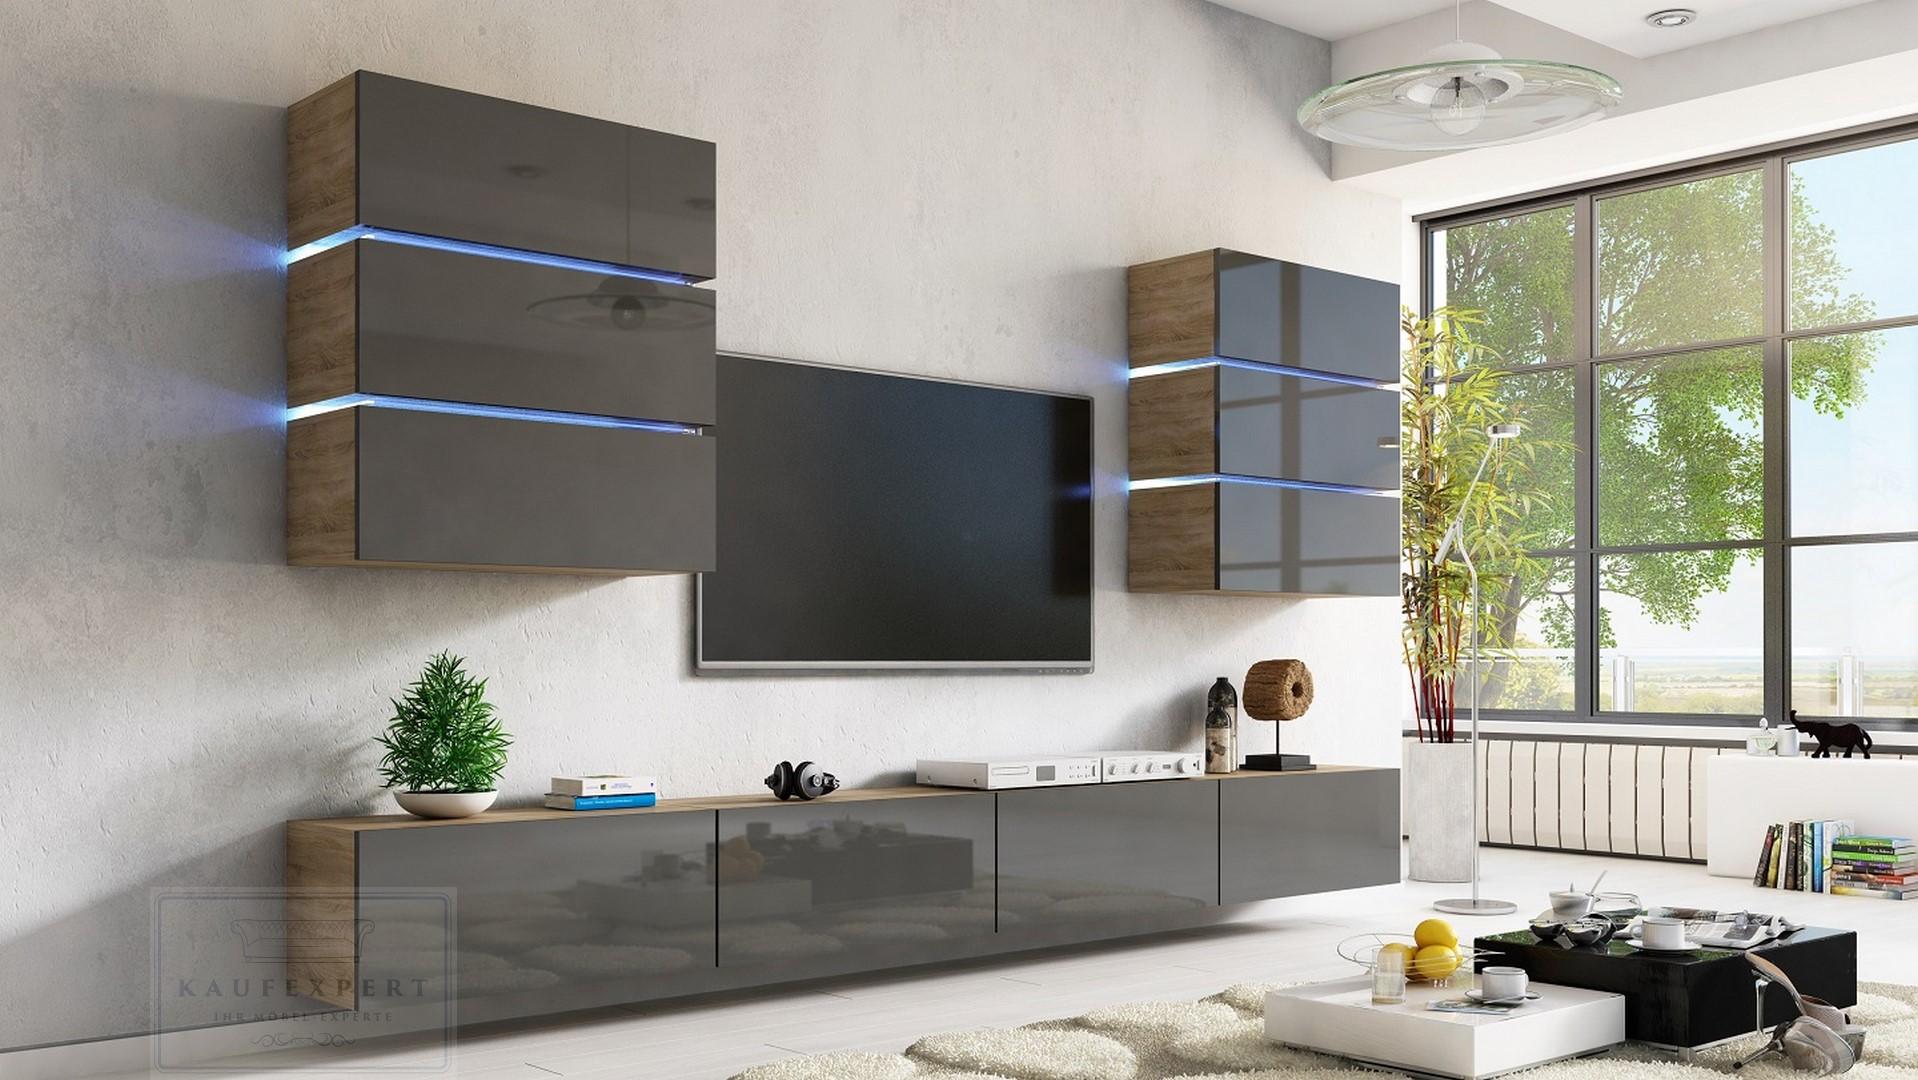 Nice Wohnwand Dream Grau Hochglanz/Sonoma Eiche Matt 332 Cm Mediawand Medienwand  Design Modern Led Beleuchtung